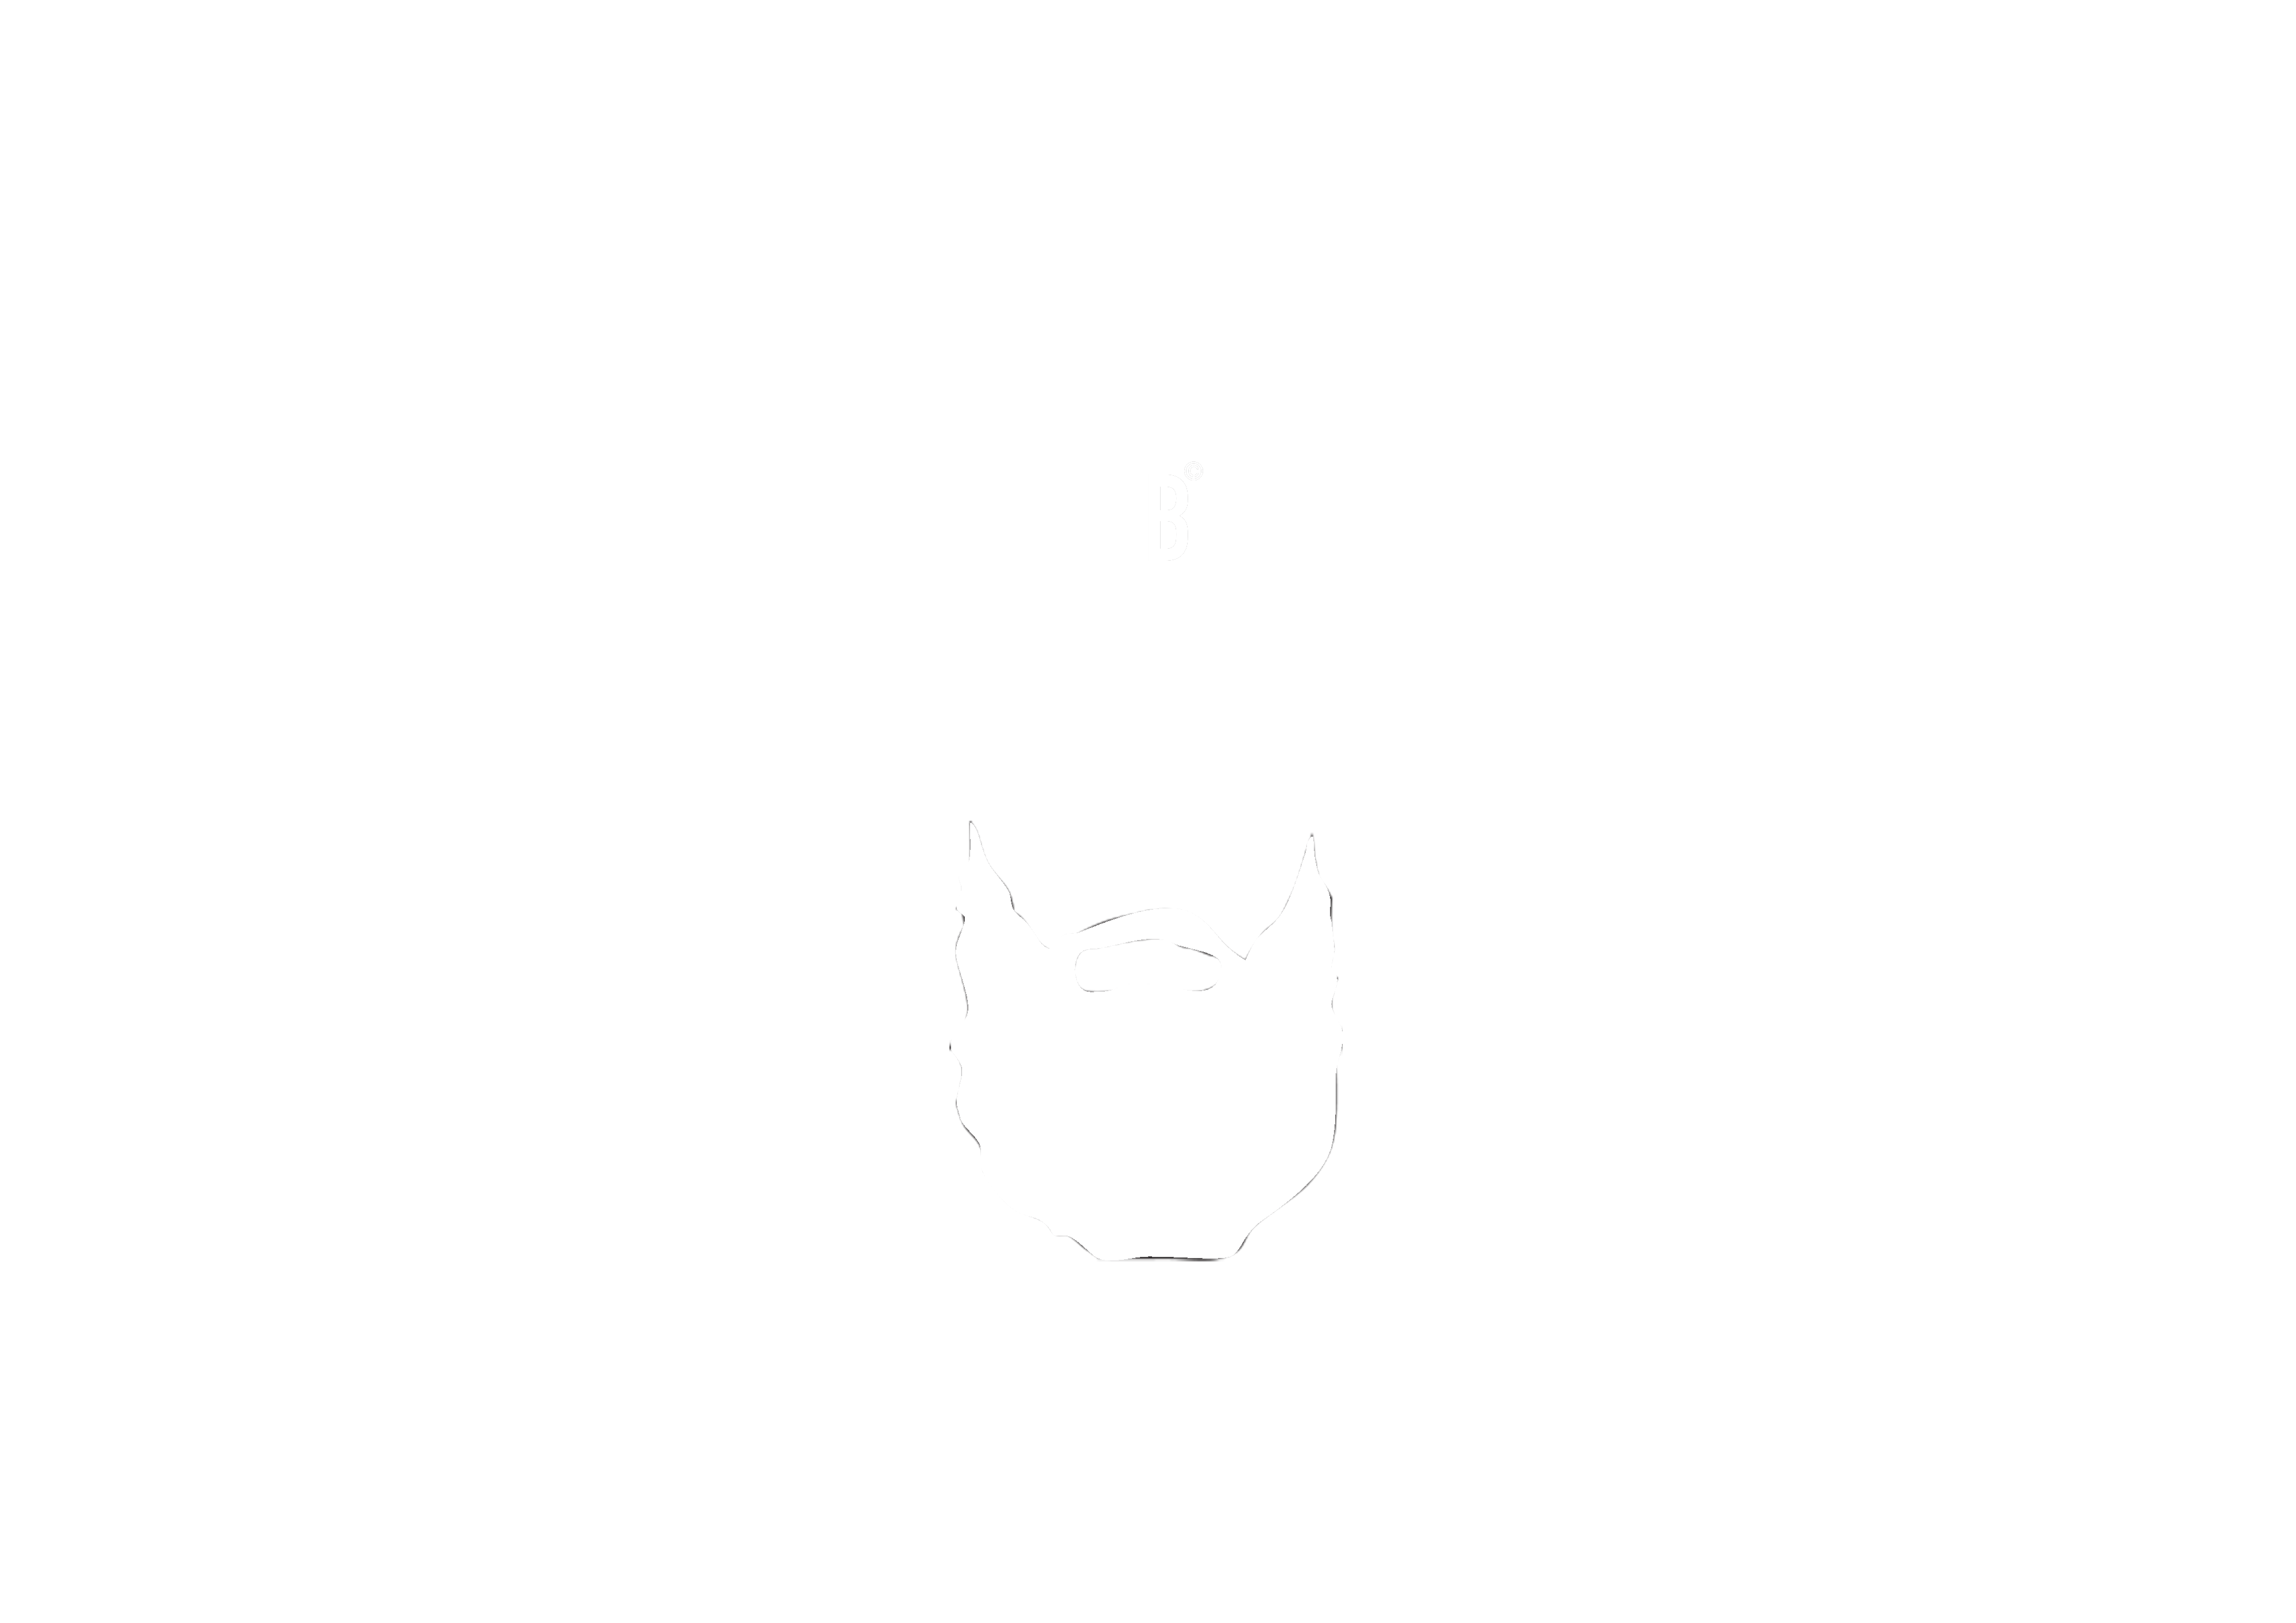 Bearded Butlers Curaçao